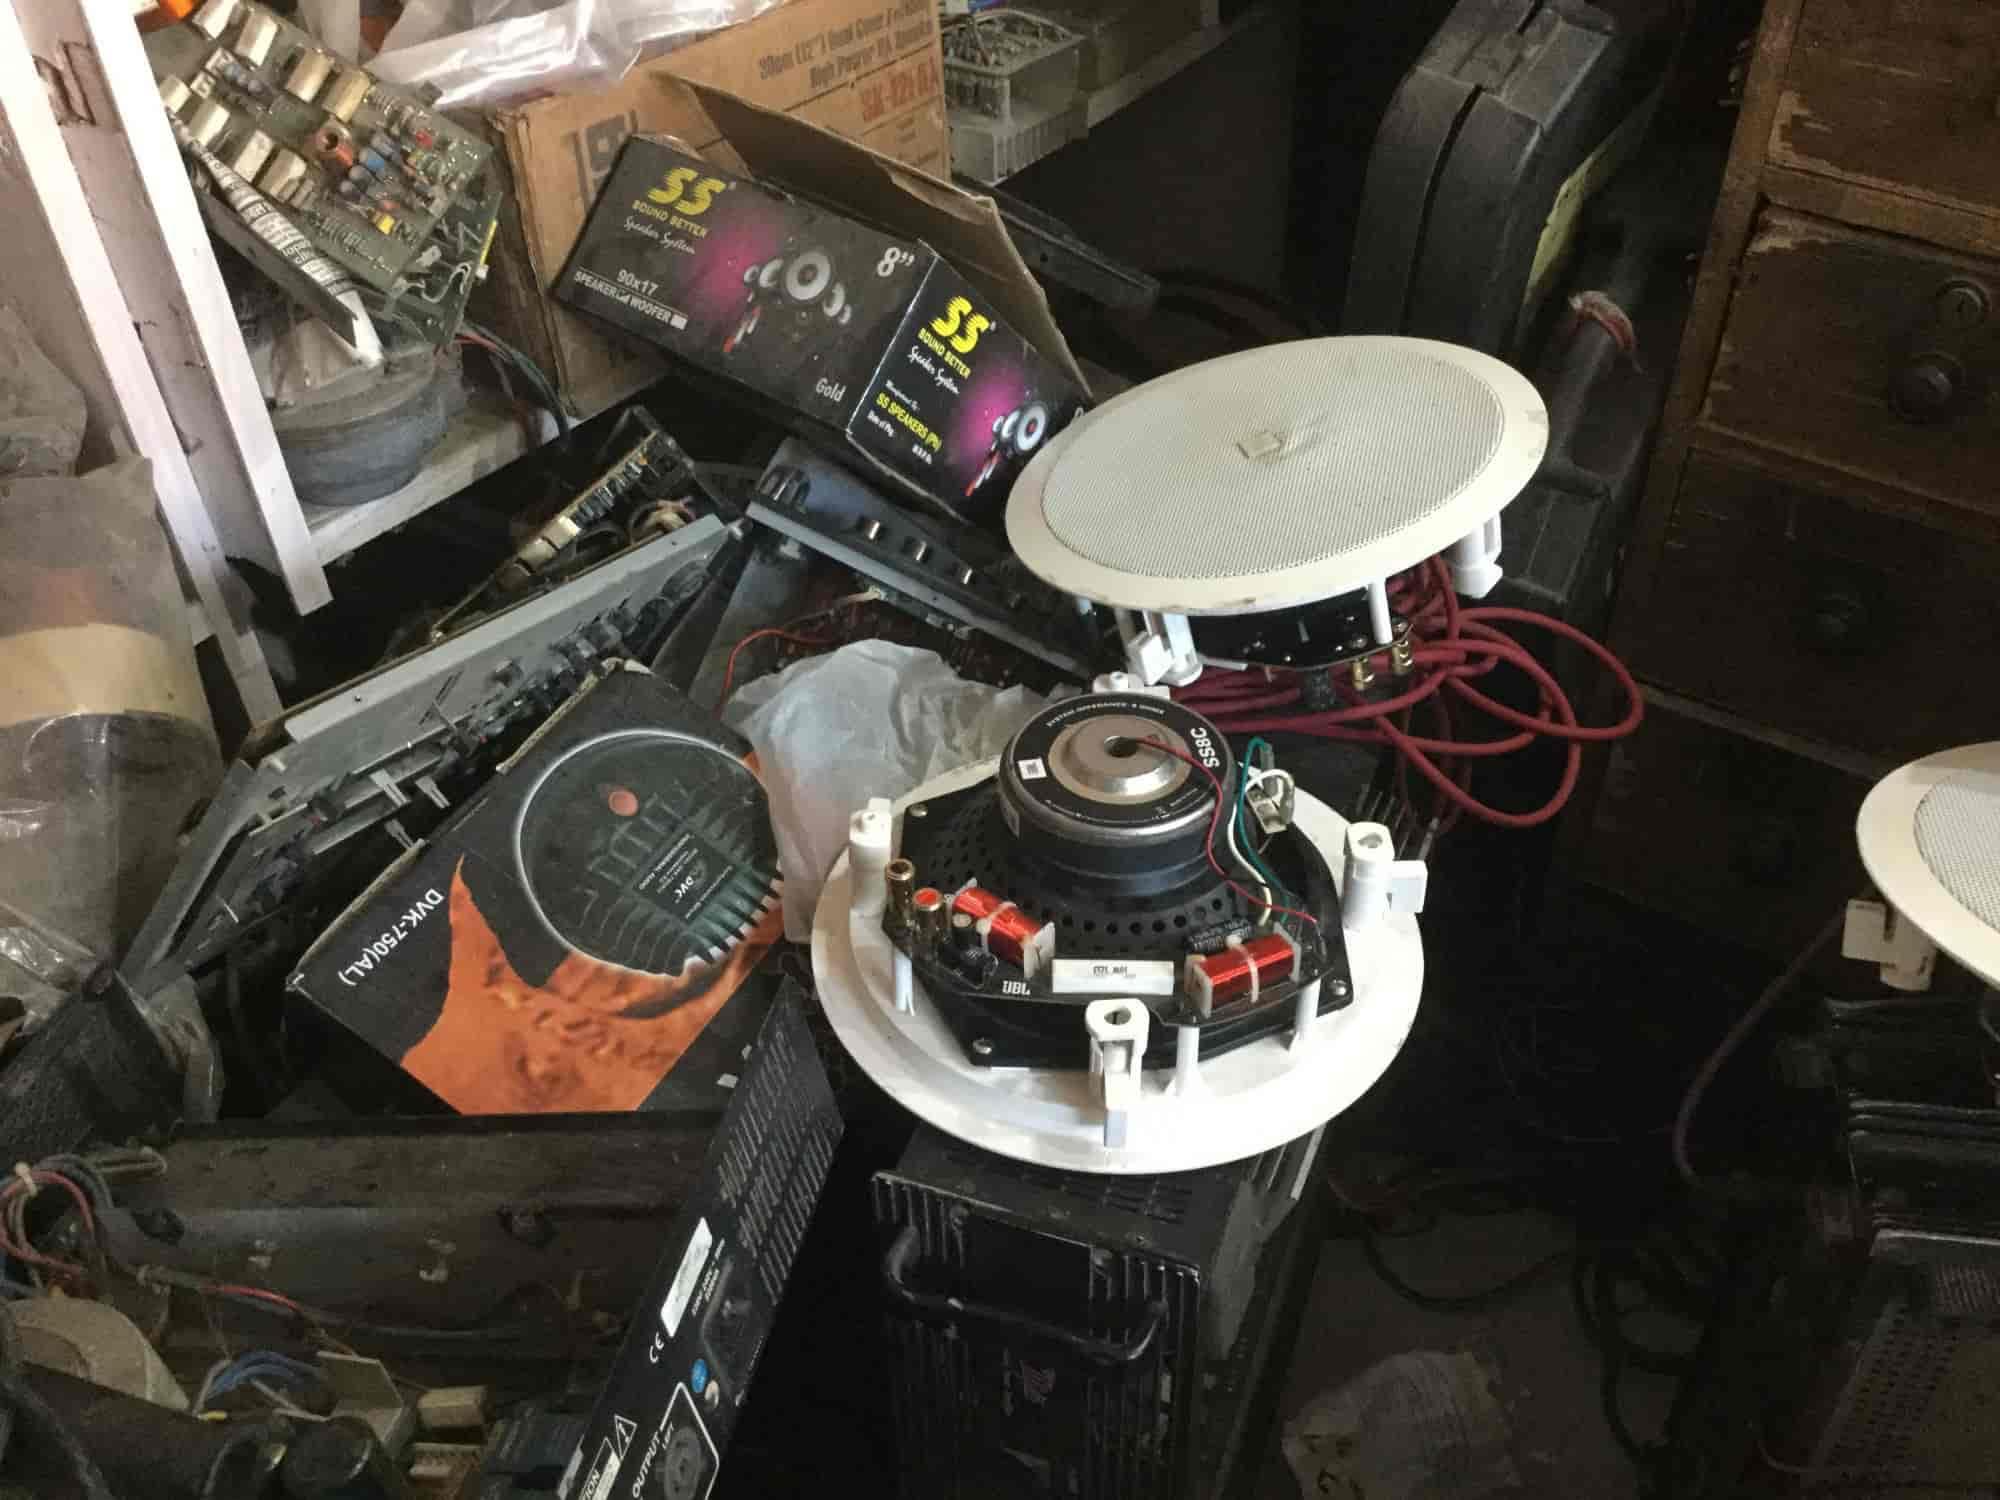 S s Sound & Dj, Ambala City - Audio System Repair & Services